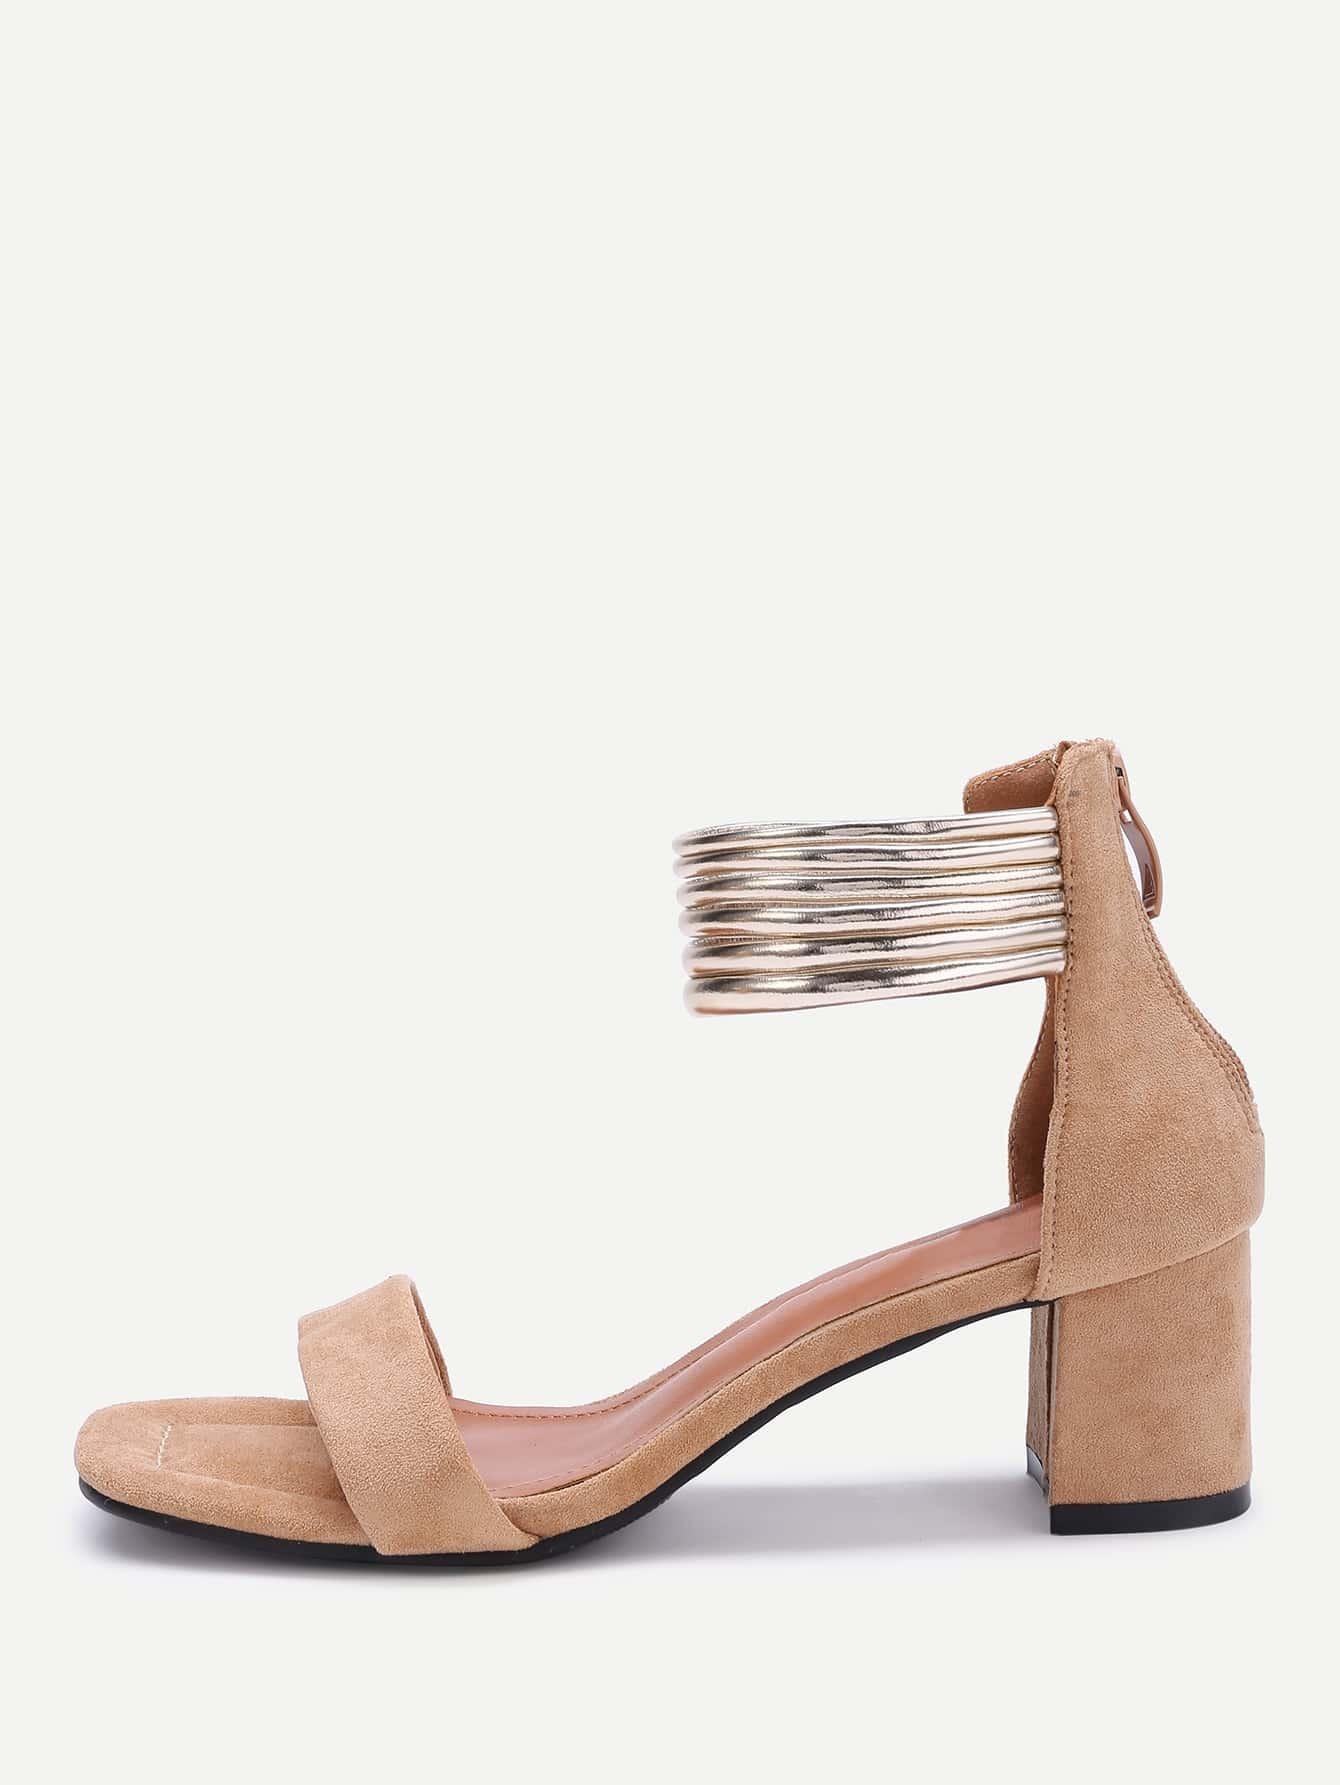 Women's Sandals, Sandals for Women Nordstrom Fashion ankle cuff sandals